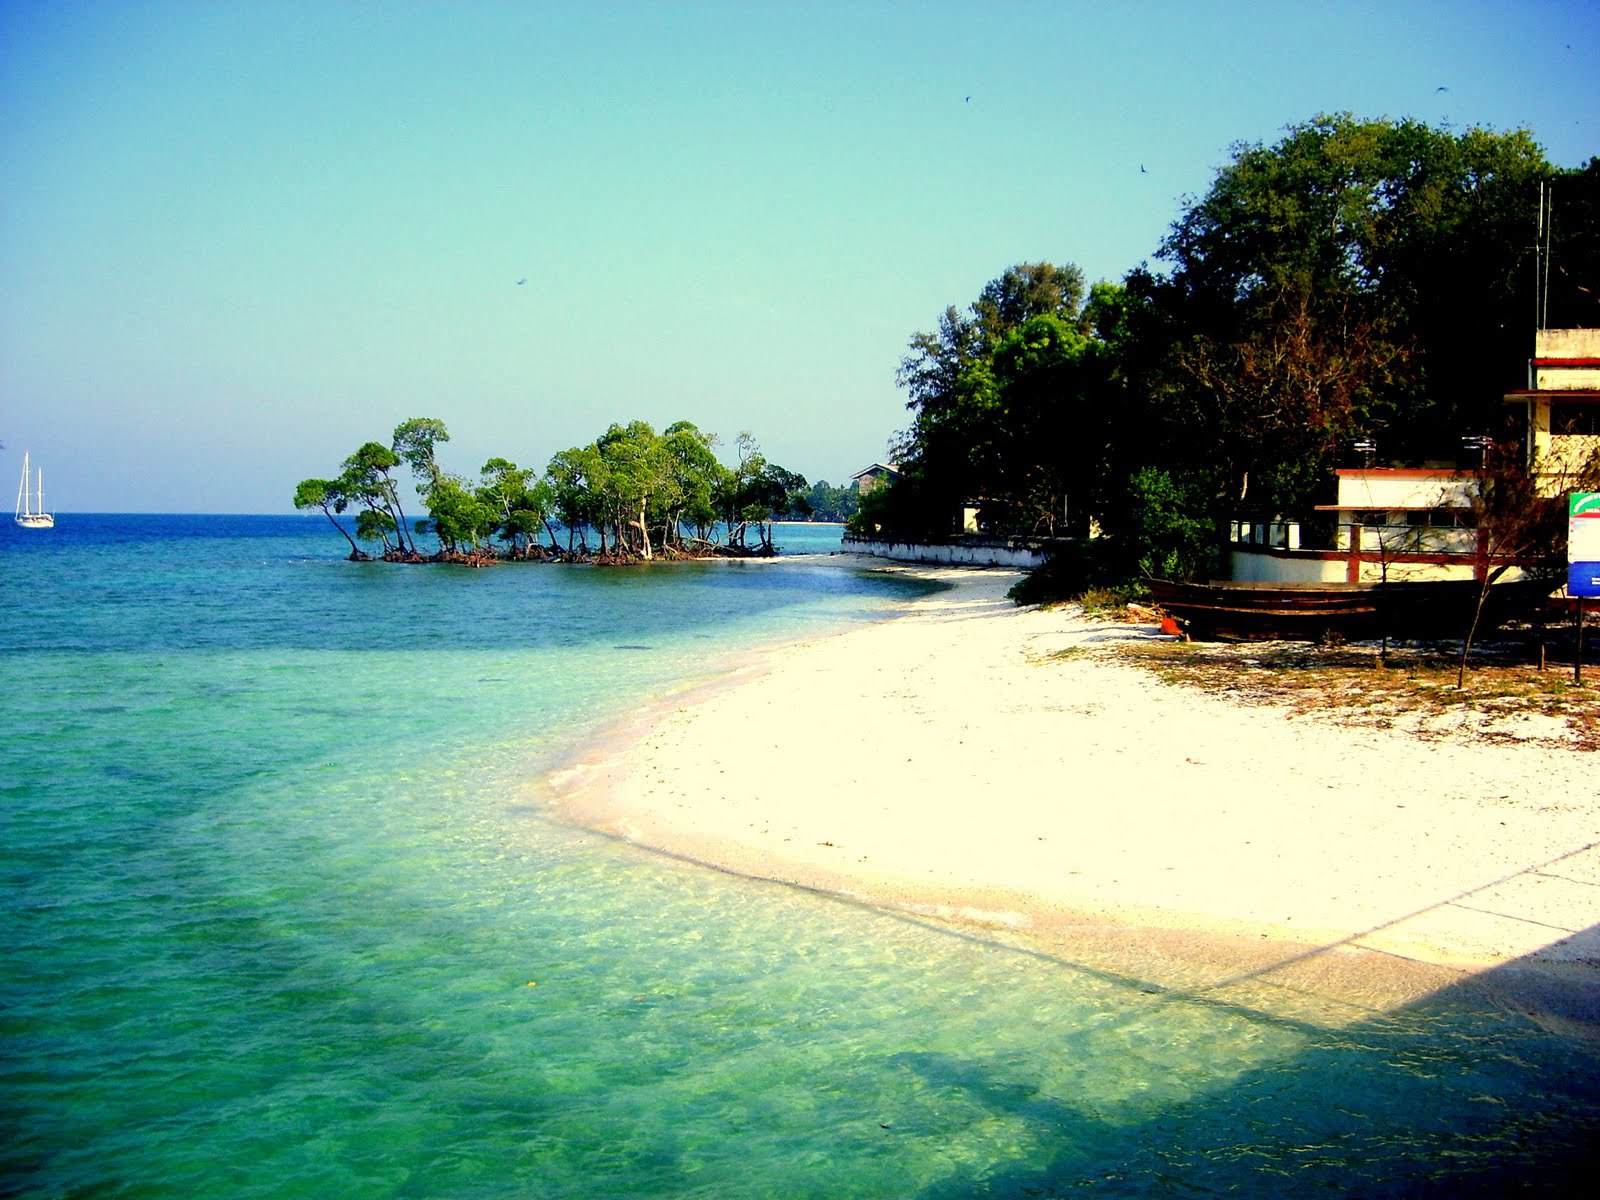 Andaman and nicobar island photos Great Nicobar Island - Wikipedia